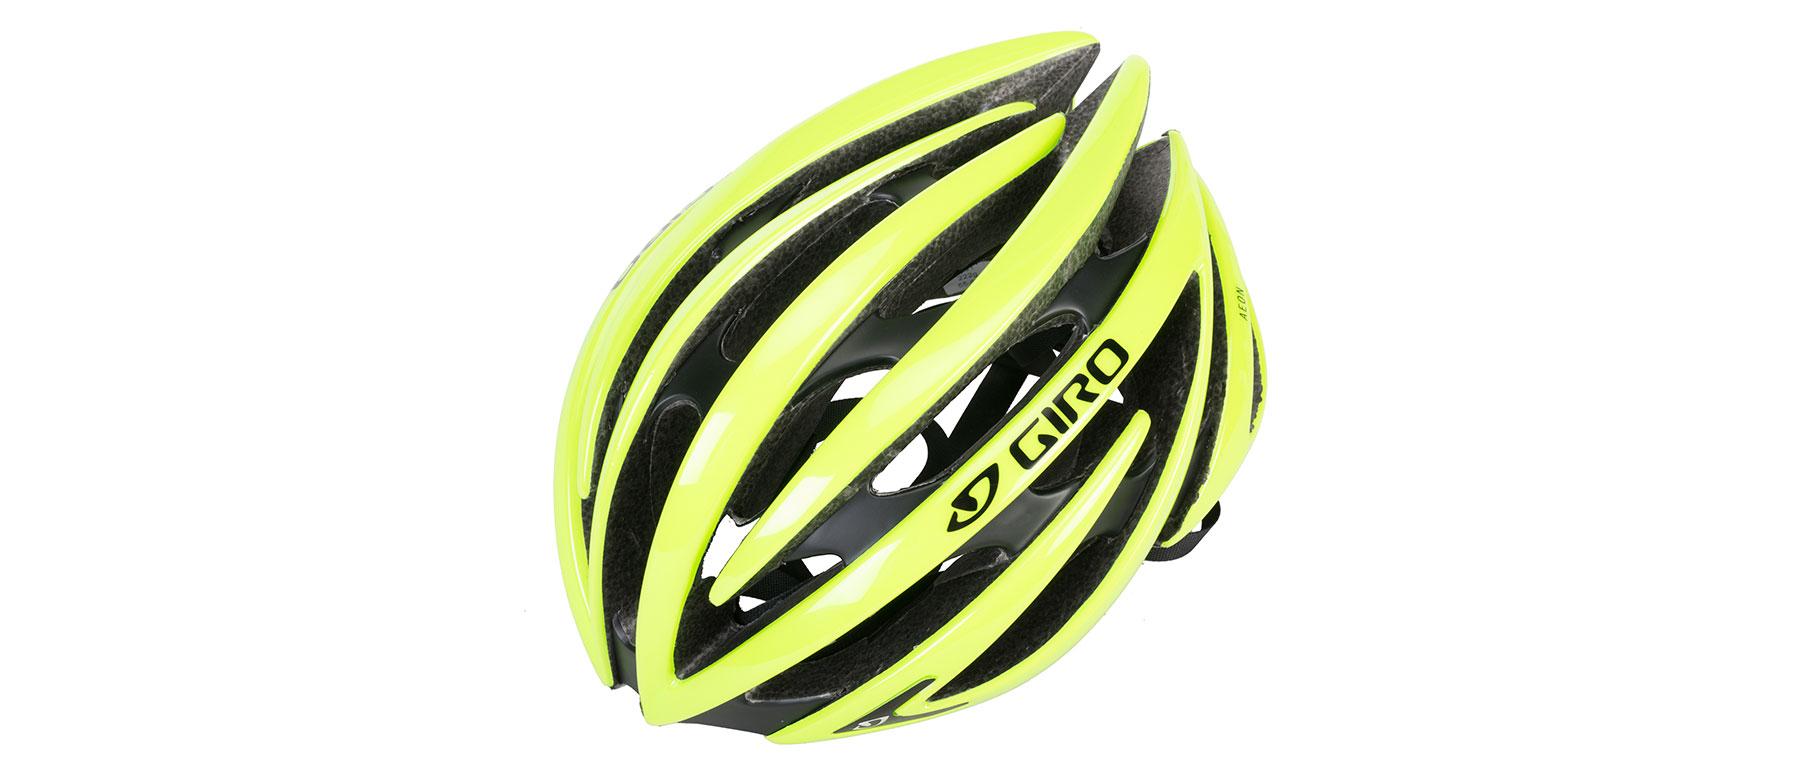 Giro Aeon Bike Helmet $108